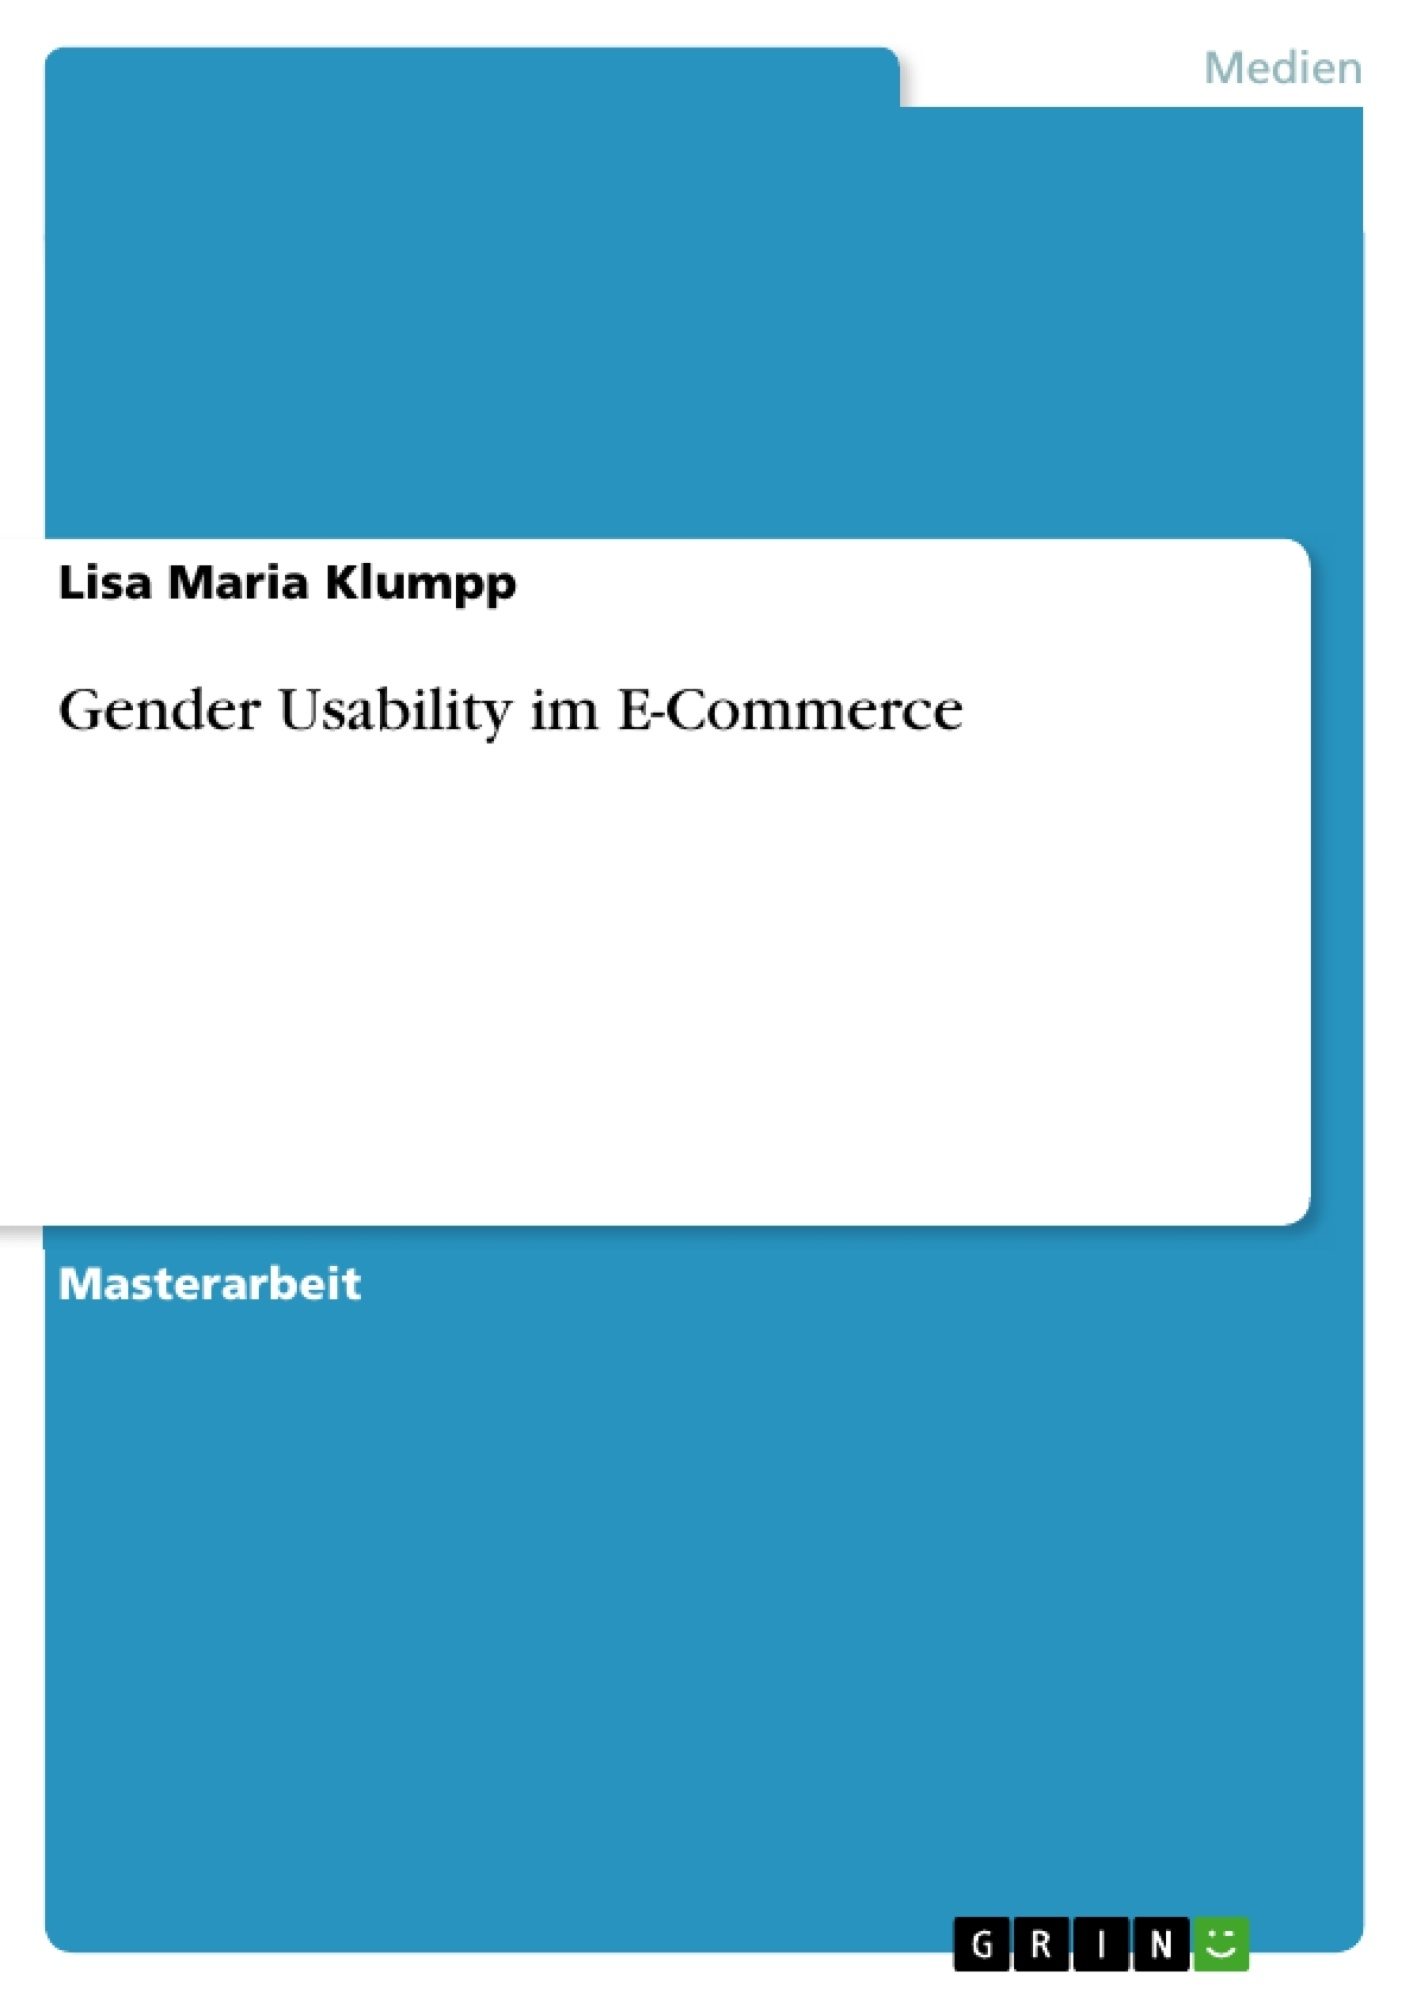 Titel: Gender Usability im E-Commerce